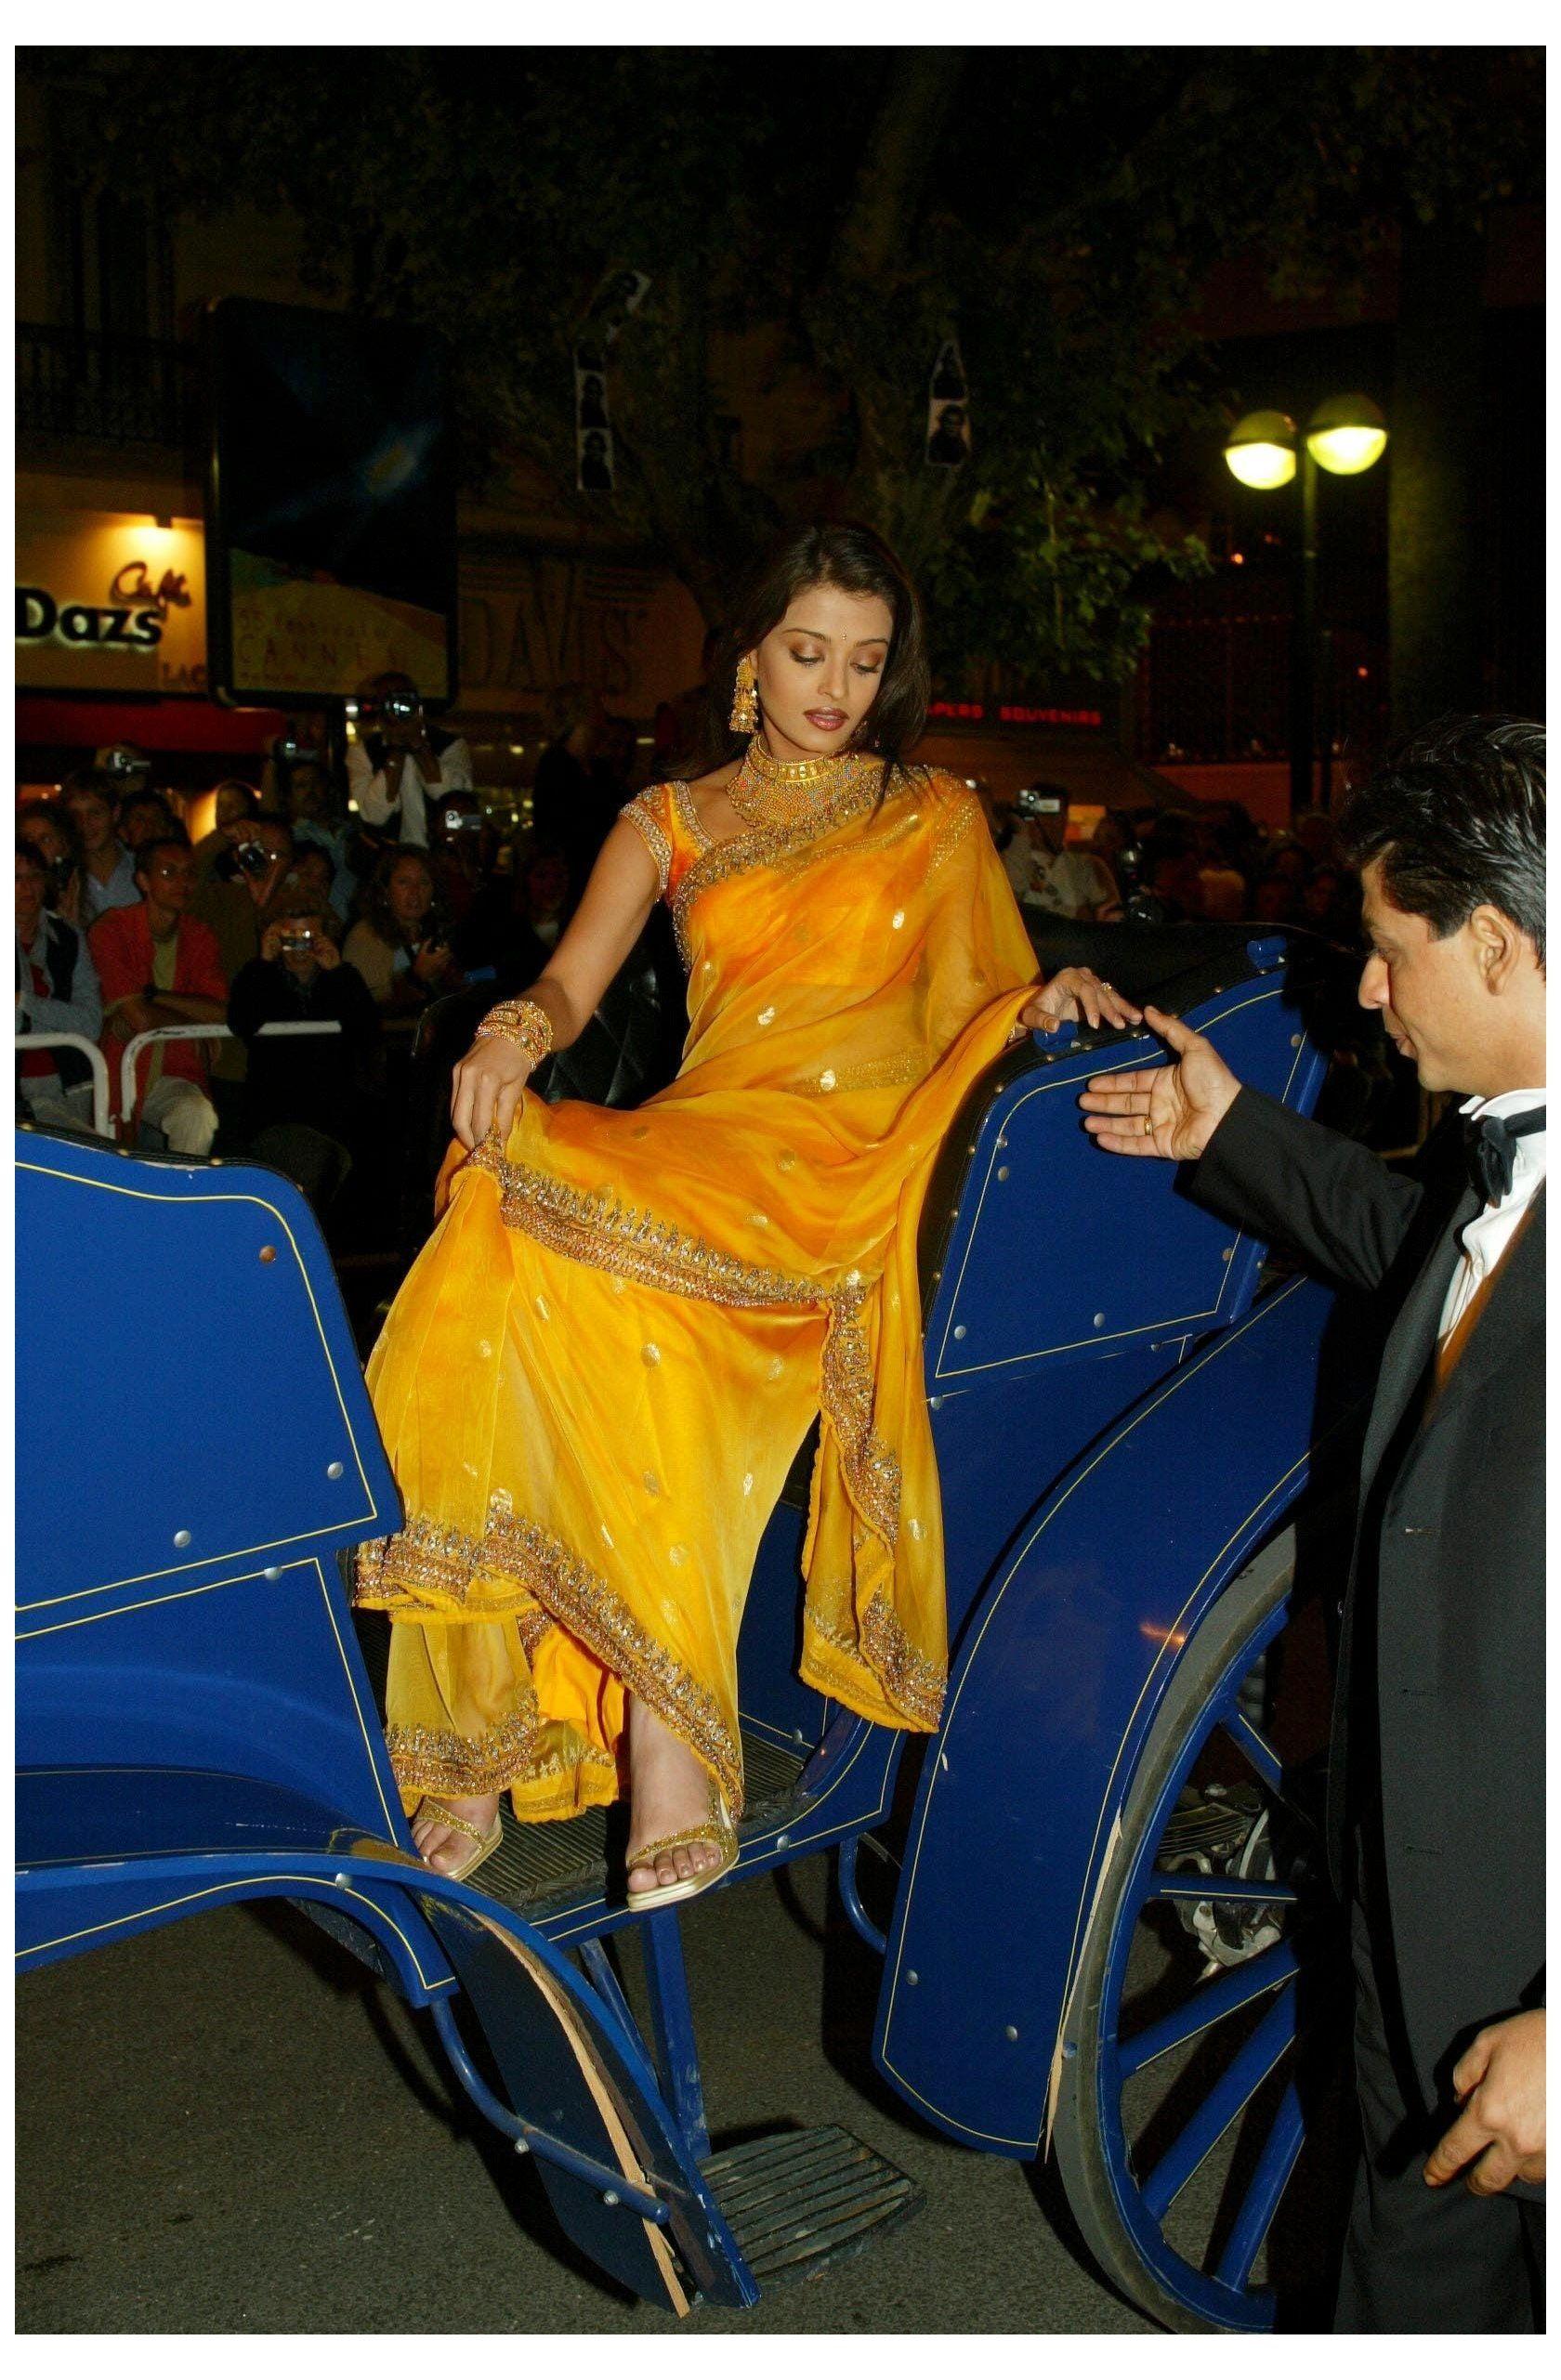 Aishwarya Rai S Best Saree Style Photos Through The Years Cannes Aishwarya Rai 90s Outfits Aishwarya Indian Celebrities Aishwarya Rai Aishwarya Rai Photo